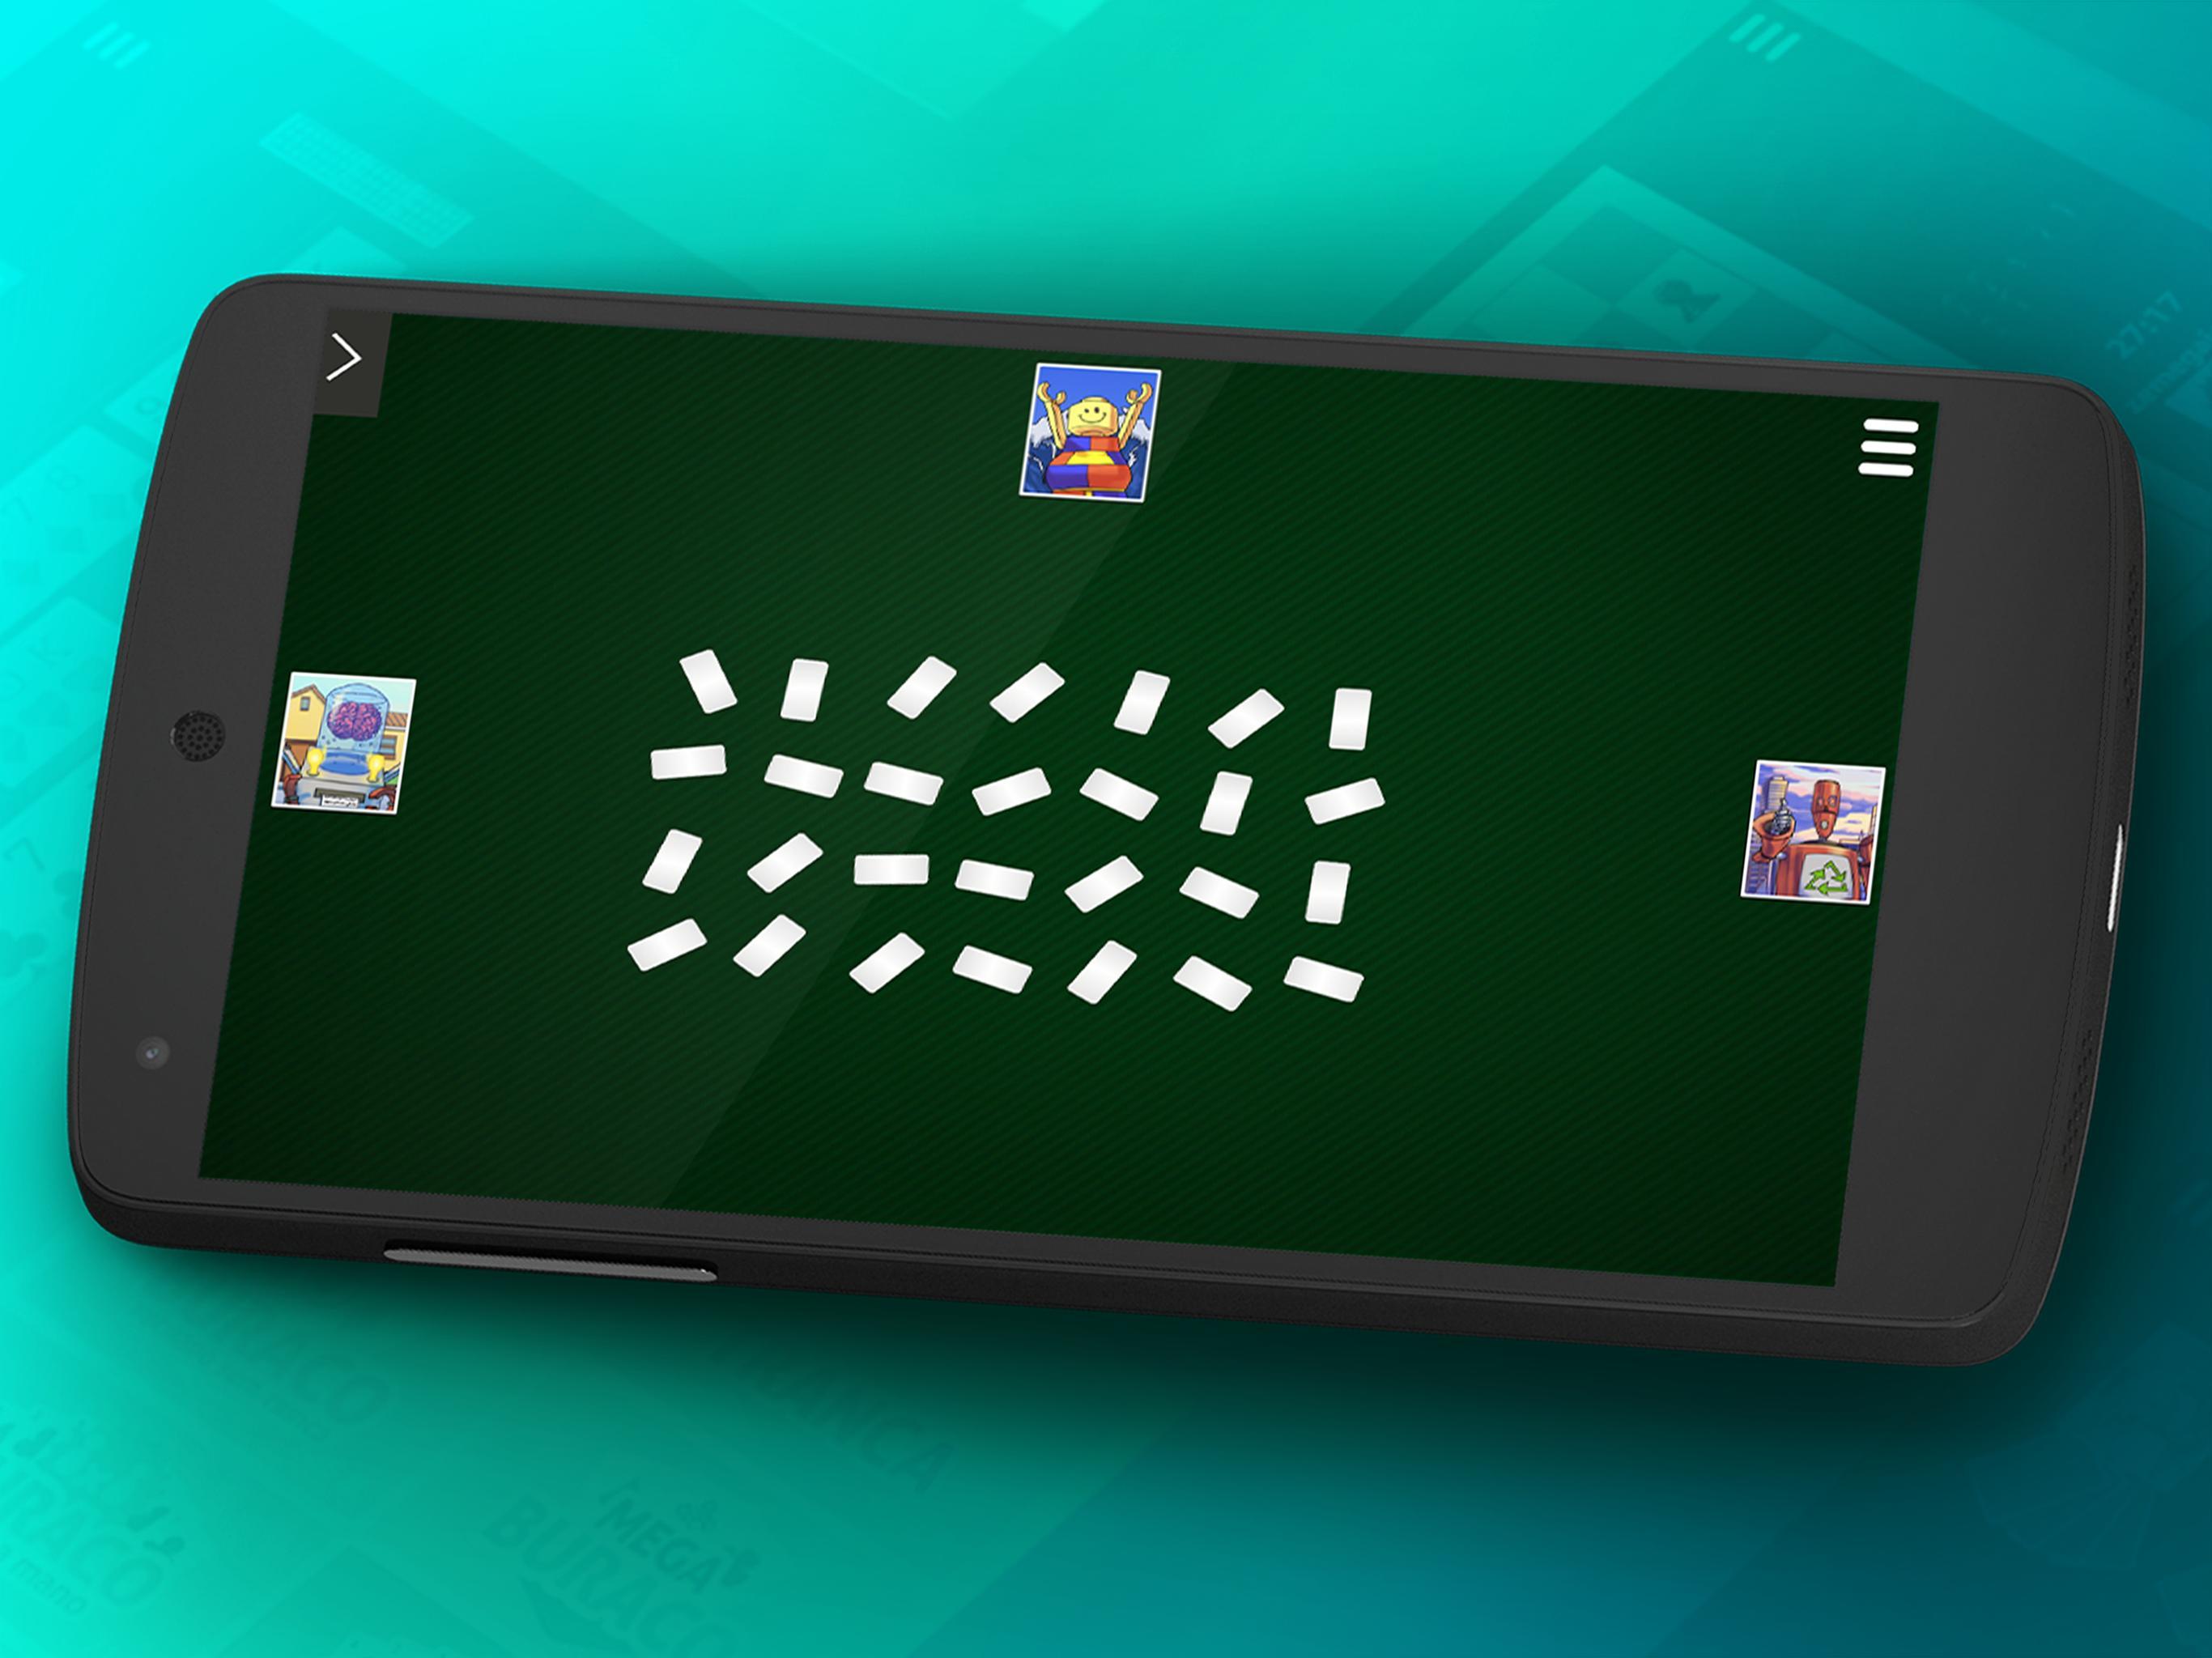 Dominoes Online - Free game 101.1.71 Screenshot 10